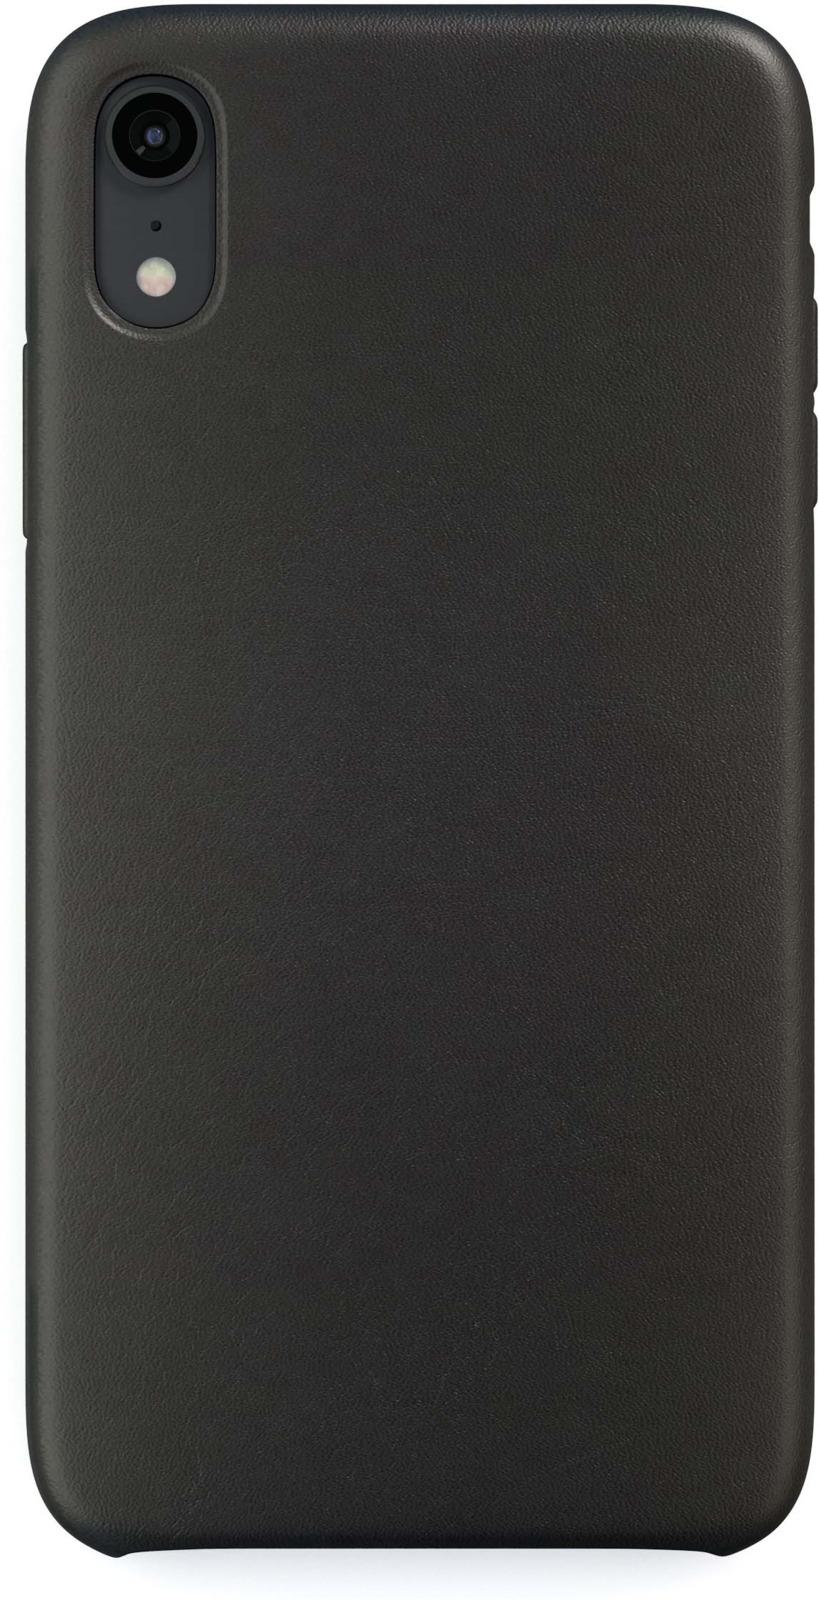 Чехол защитный uBear Capital Leather Case для iPhone XR, CS42BL01-I18, черный original view window flip pu leather case cover for uhappy up920